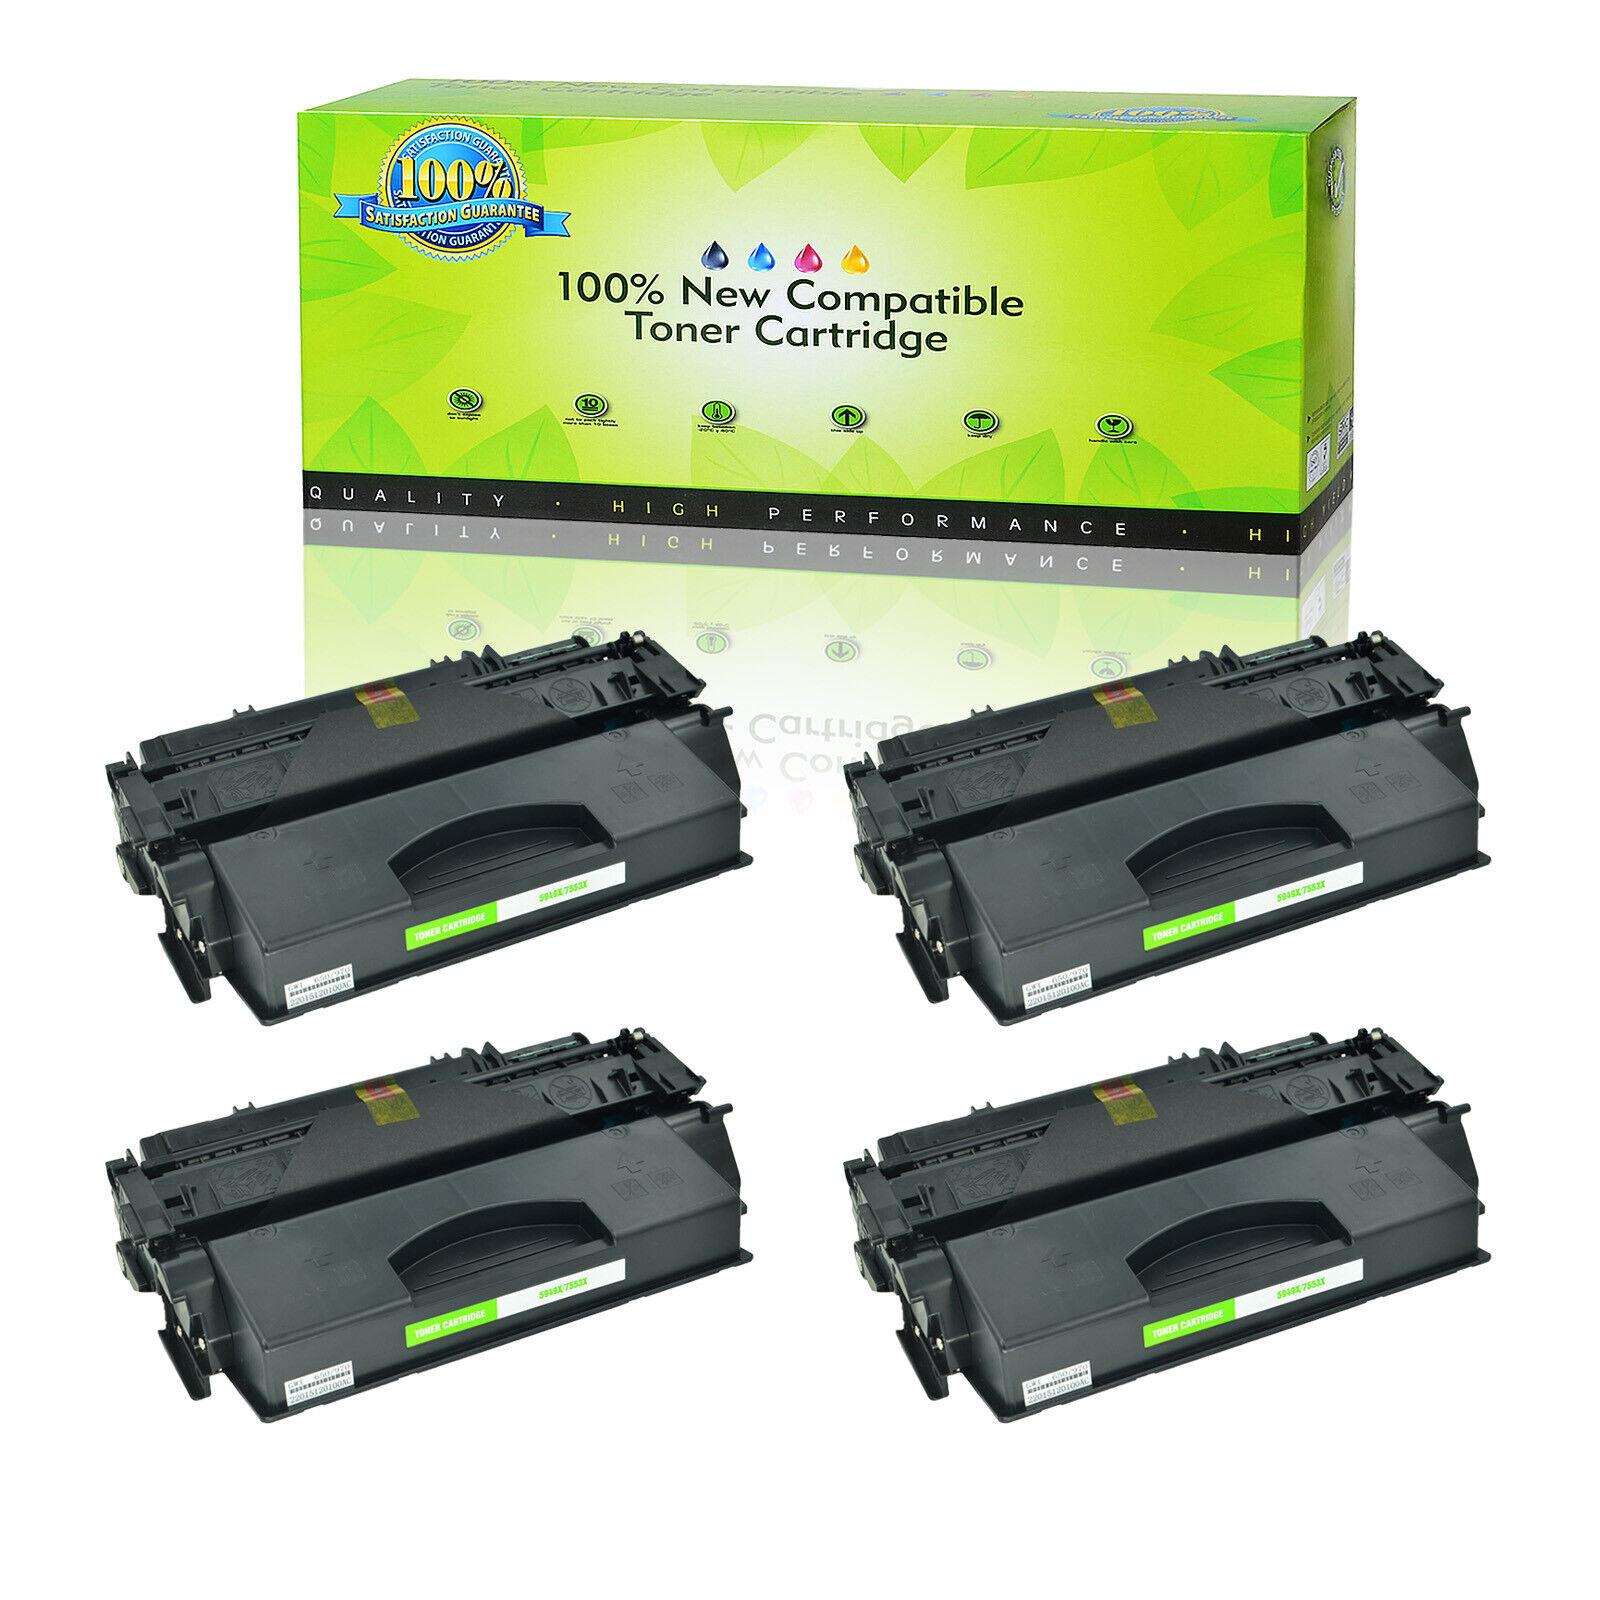 10 Q7553X 53X Q7553A M2727 P2015 New Toner Cartridge for HP